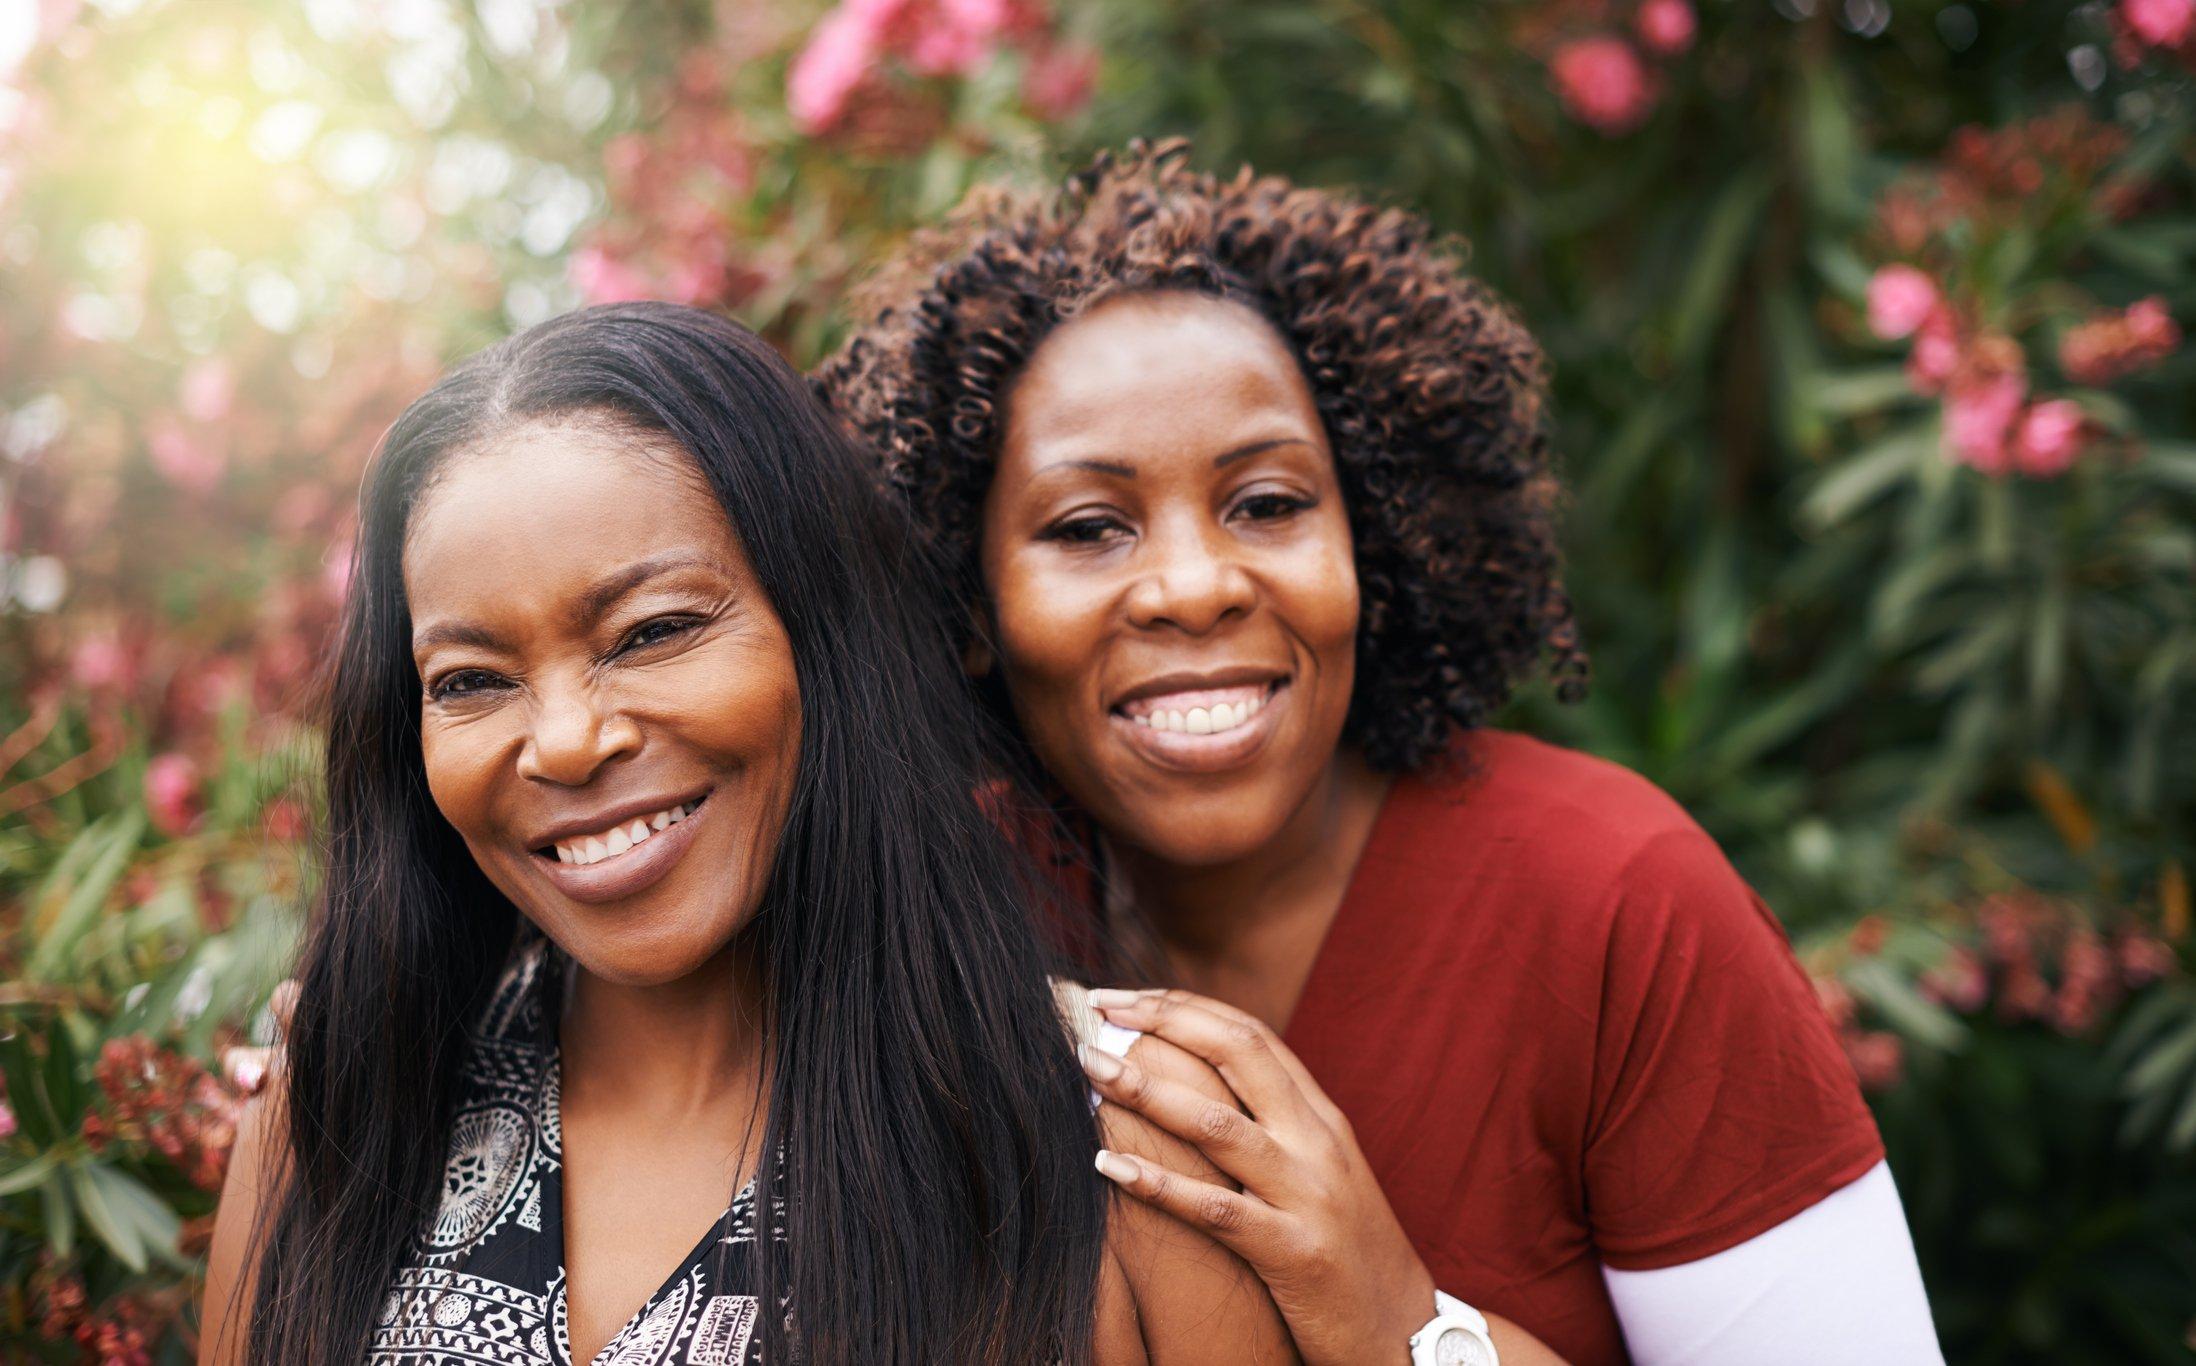 The Gender Gap: Women Predominate Among Caregivers of the Elderly